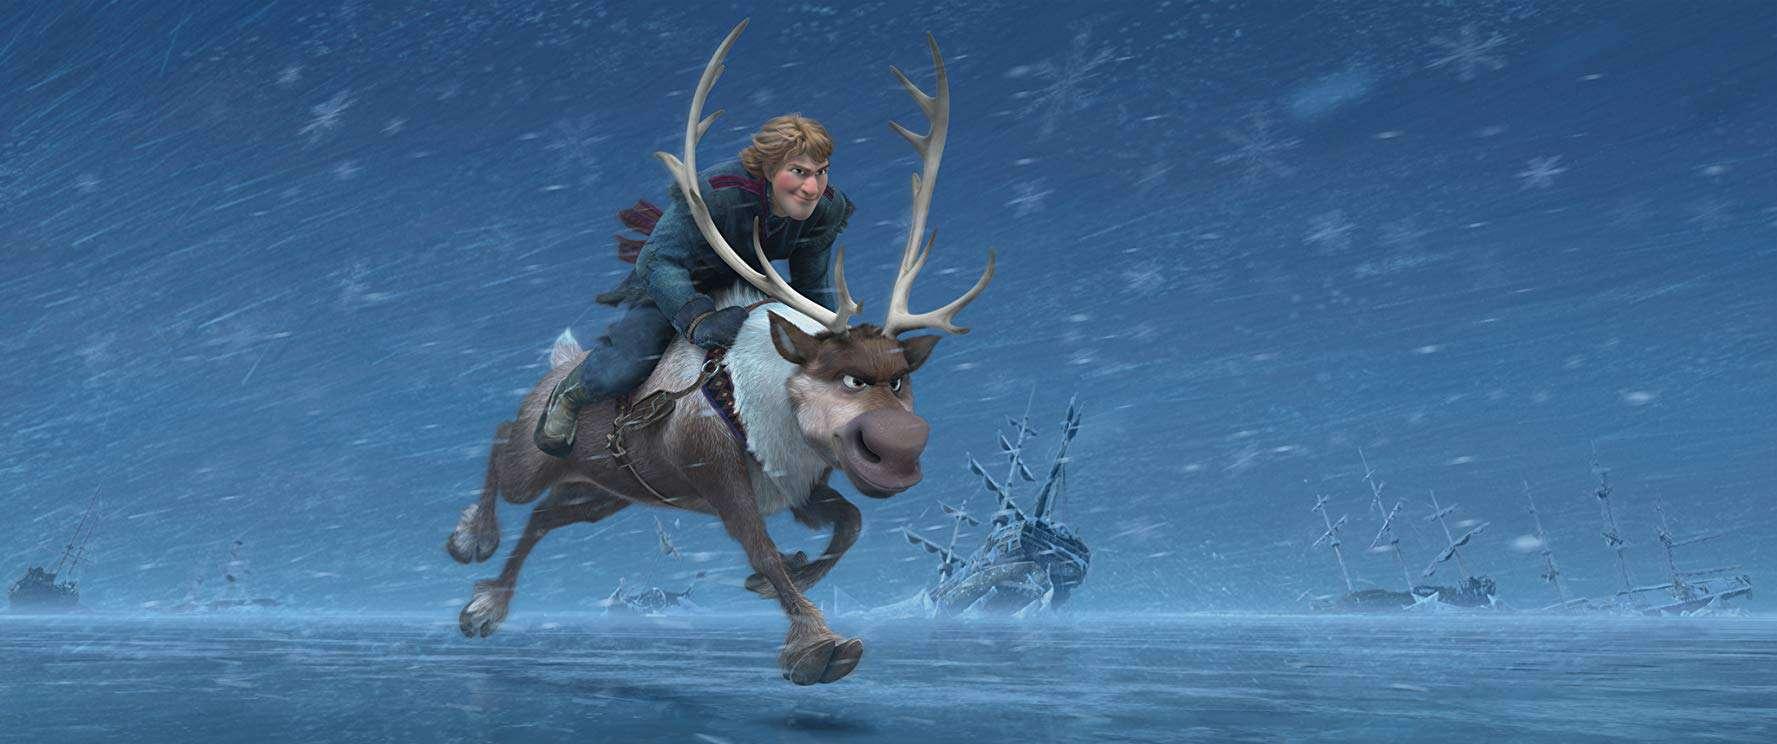 Frozen Kristoff and Sven